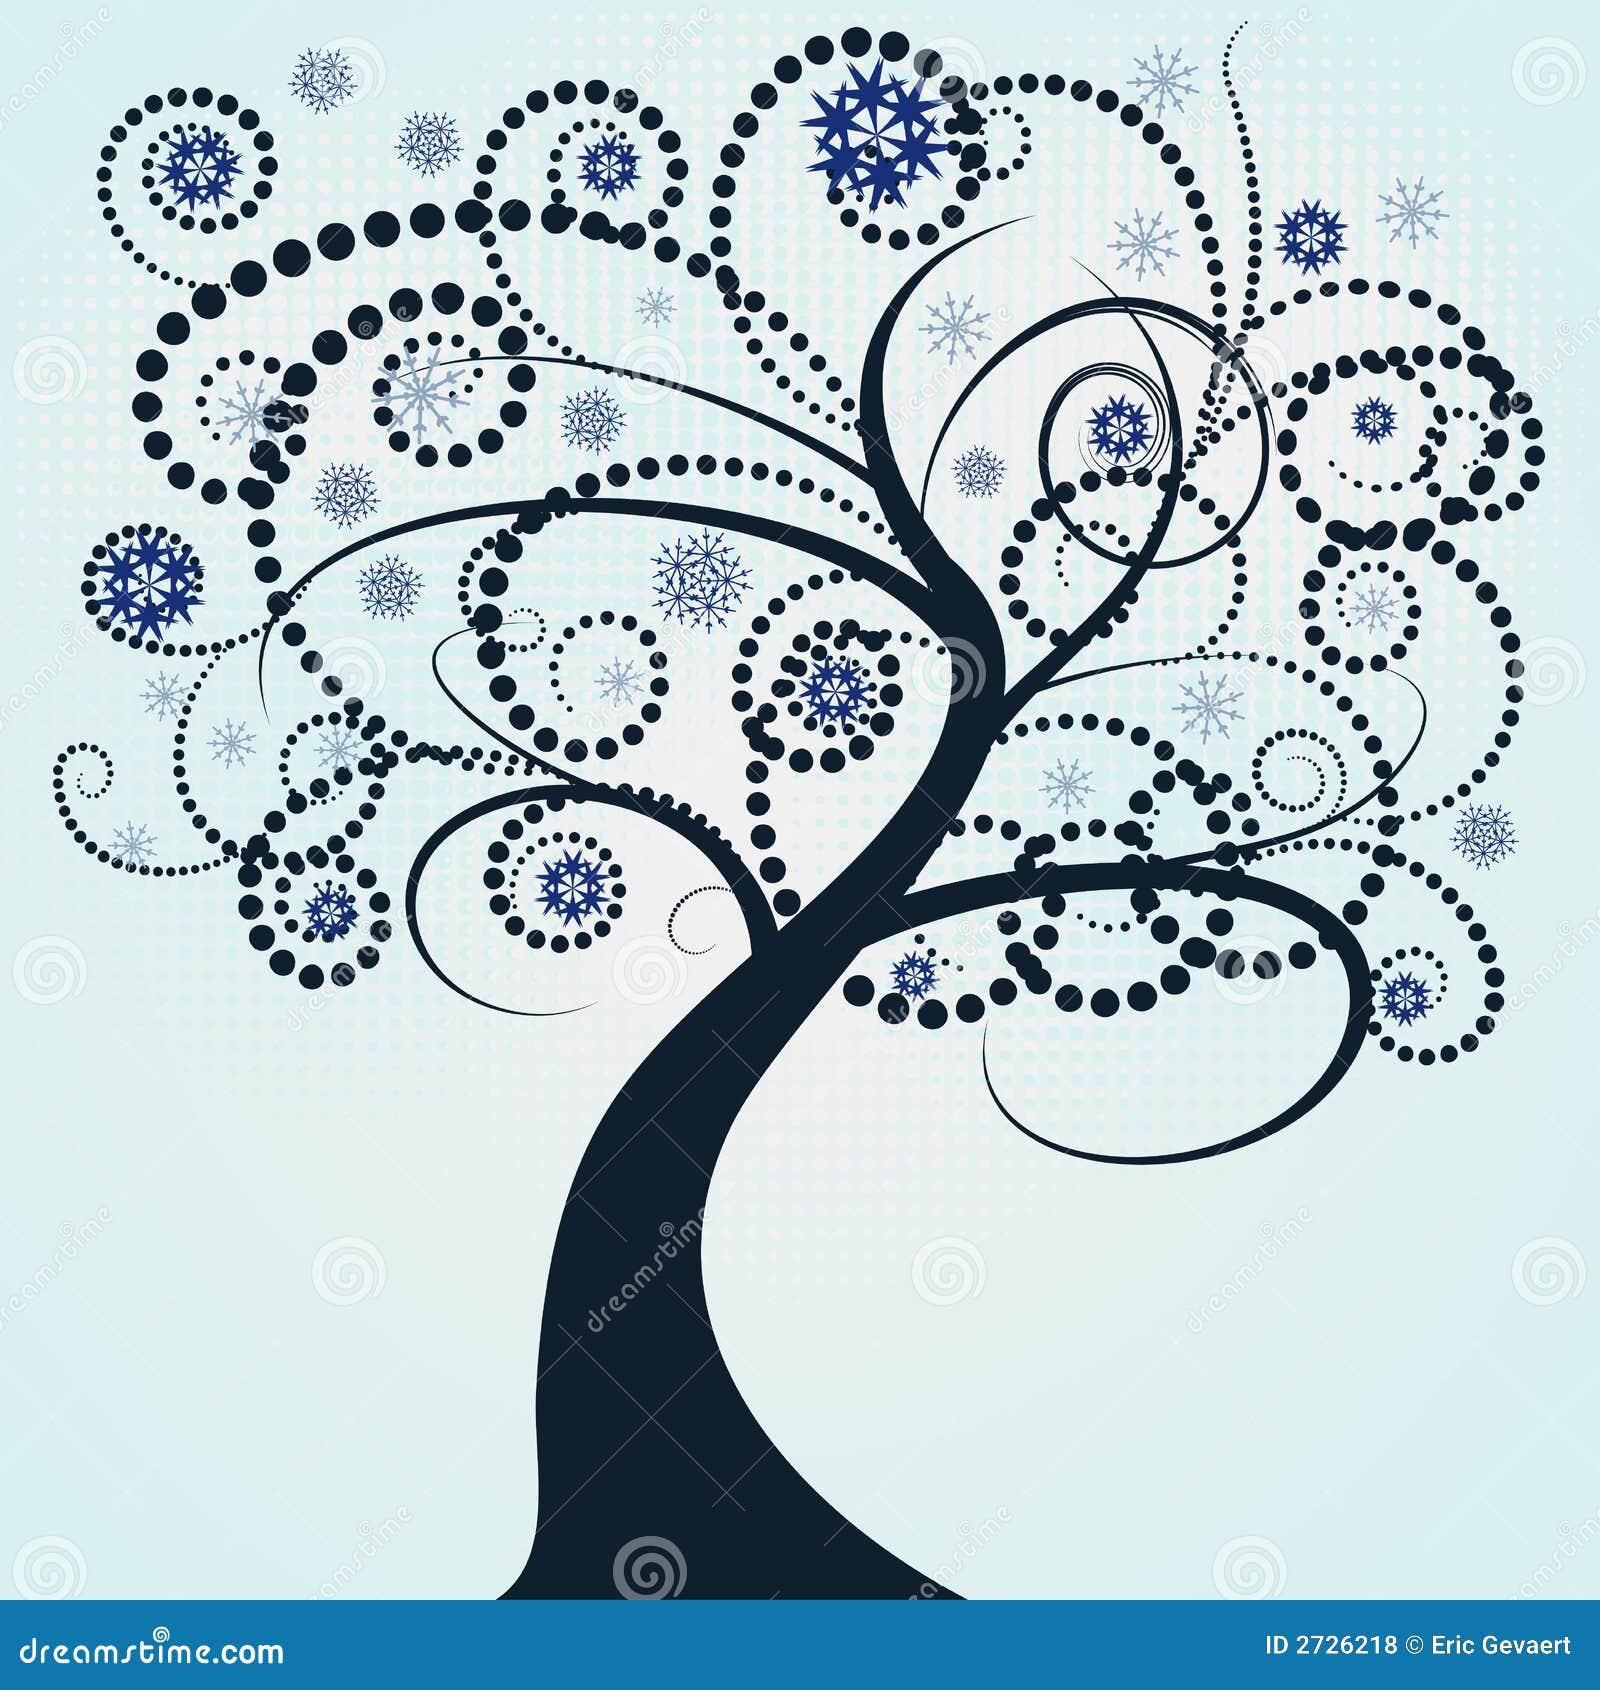 Abstract vector winter tree de